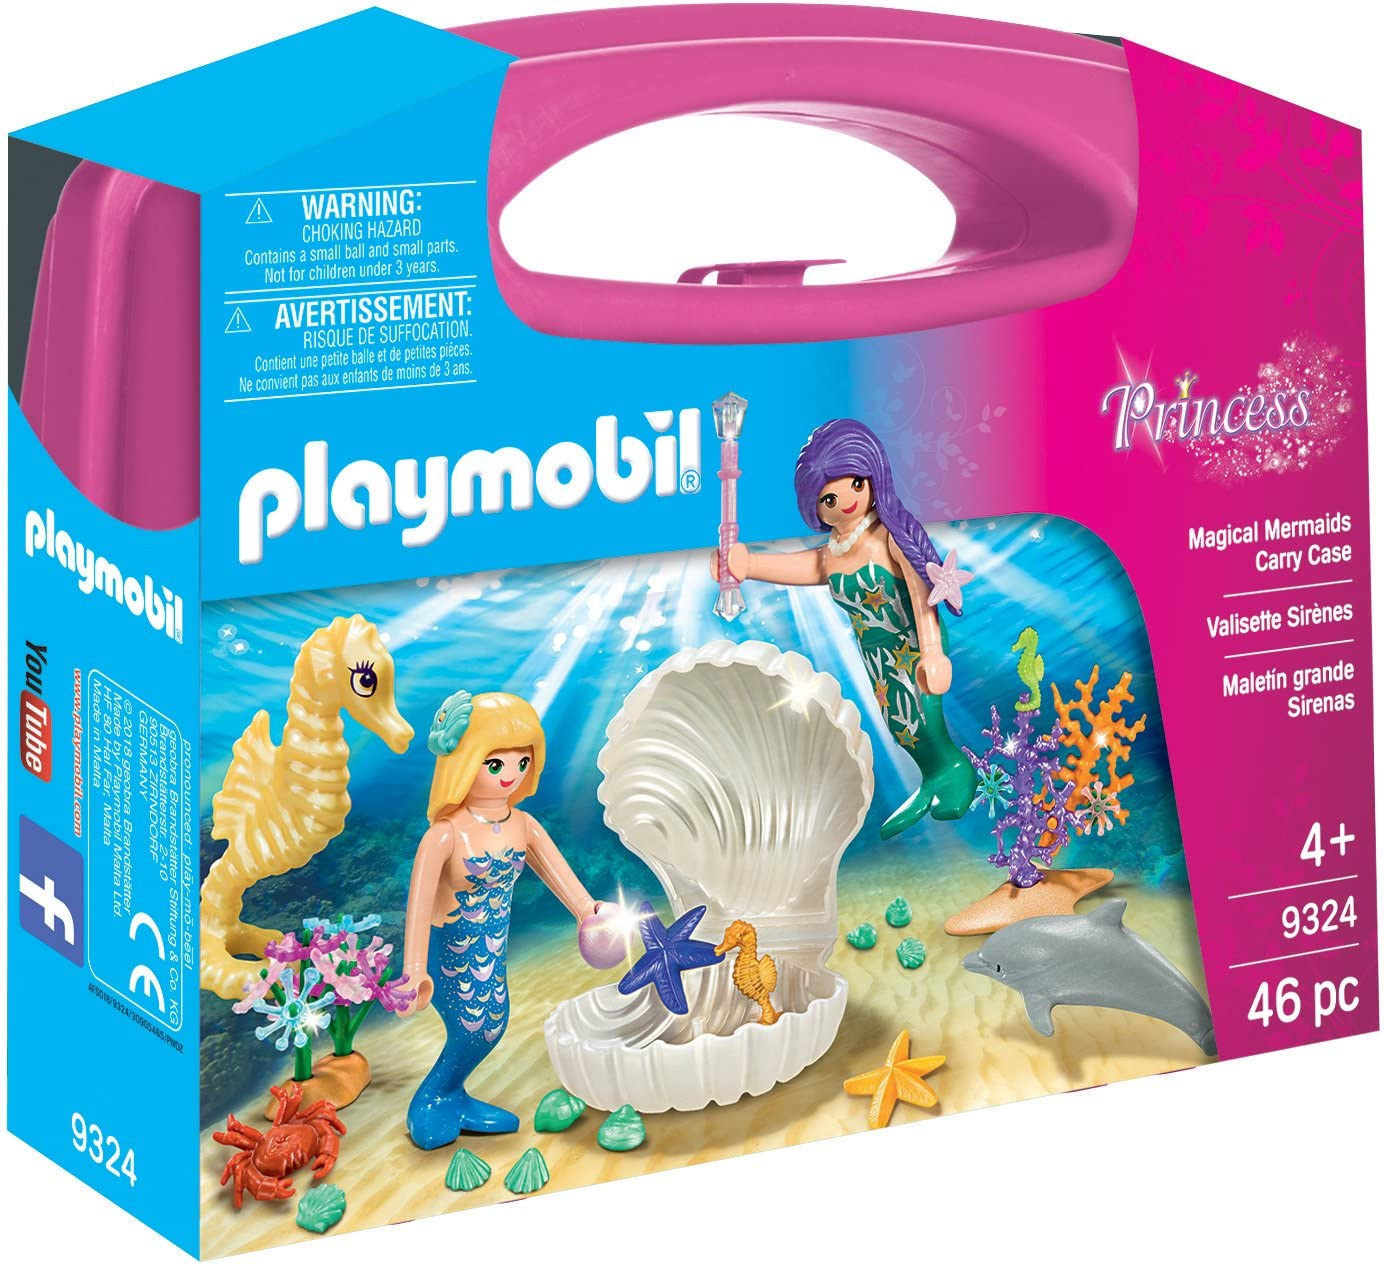 Playmobil 9324 Playmobil Mermaids Carry Case